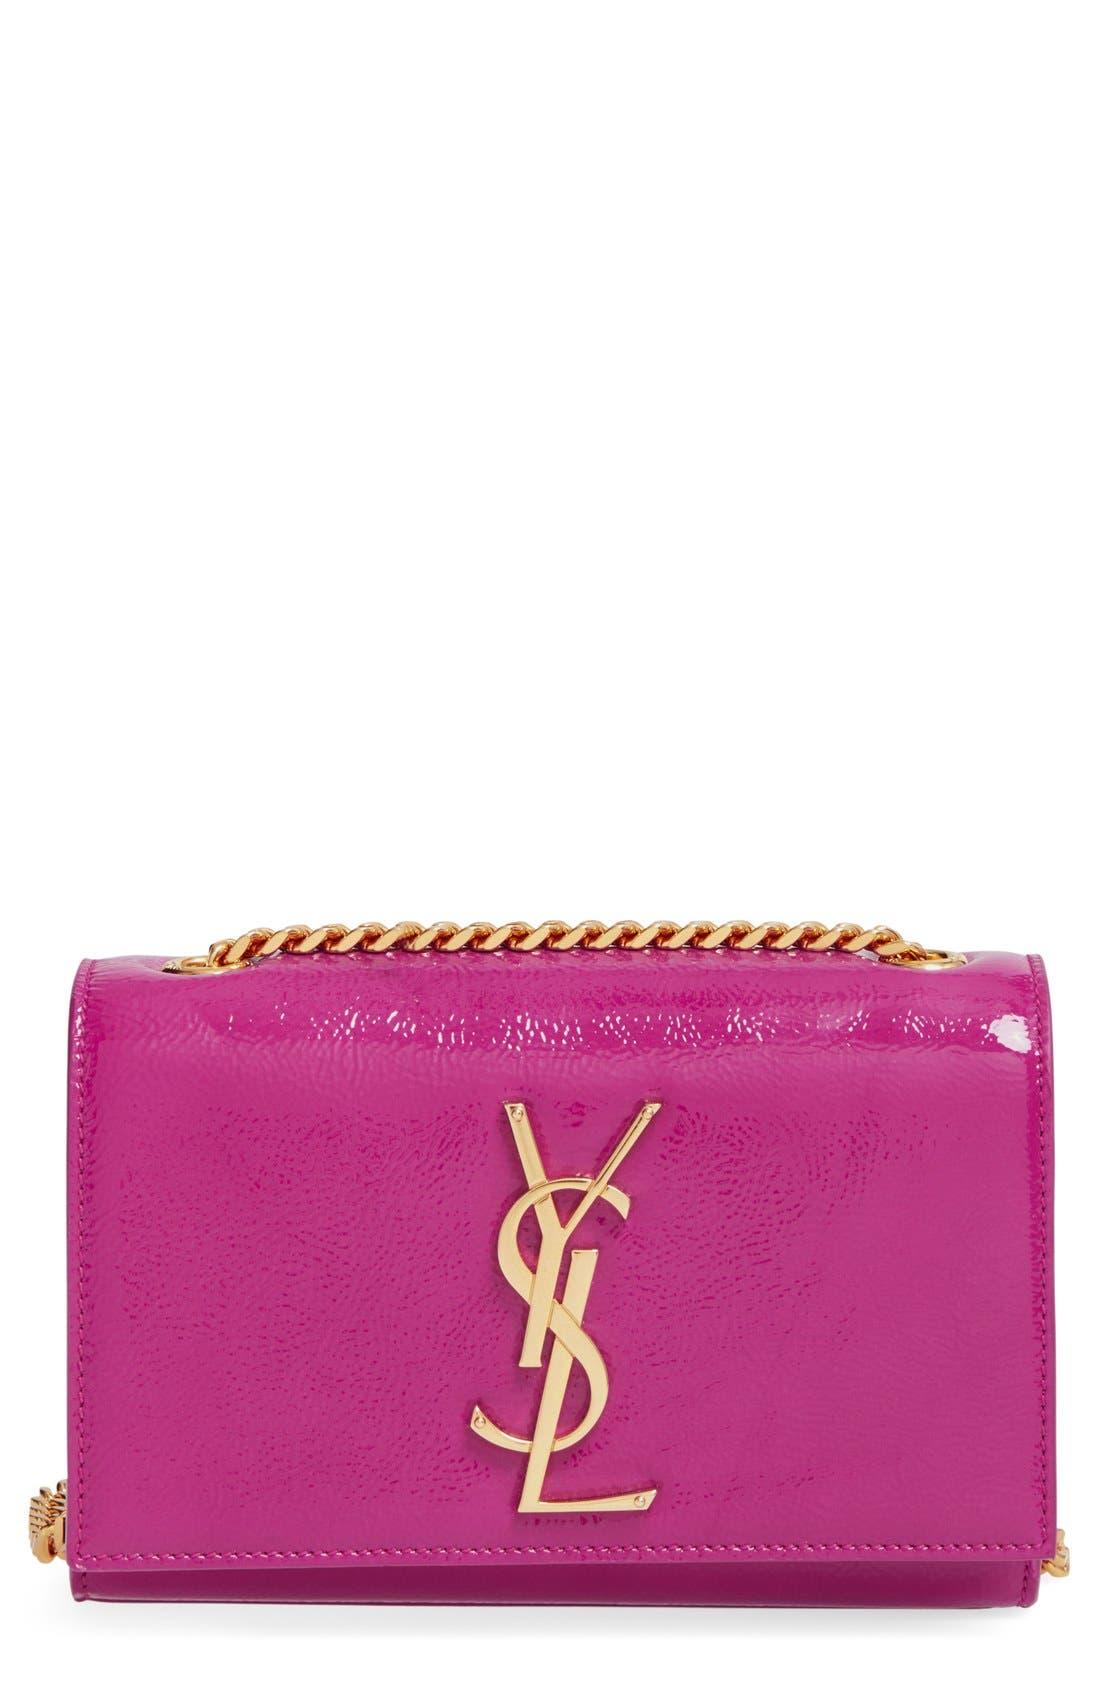 Main Image - Saint Laurent 'Mini Monogram Vernis' Handbag